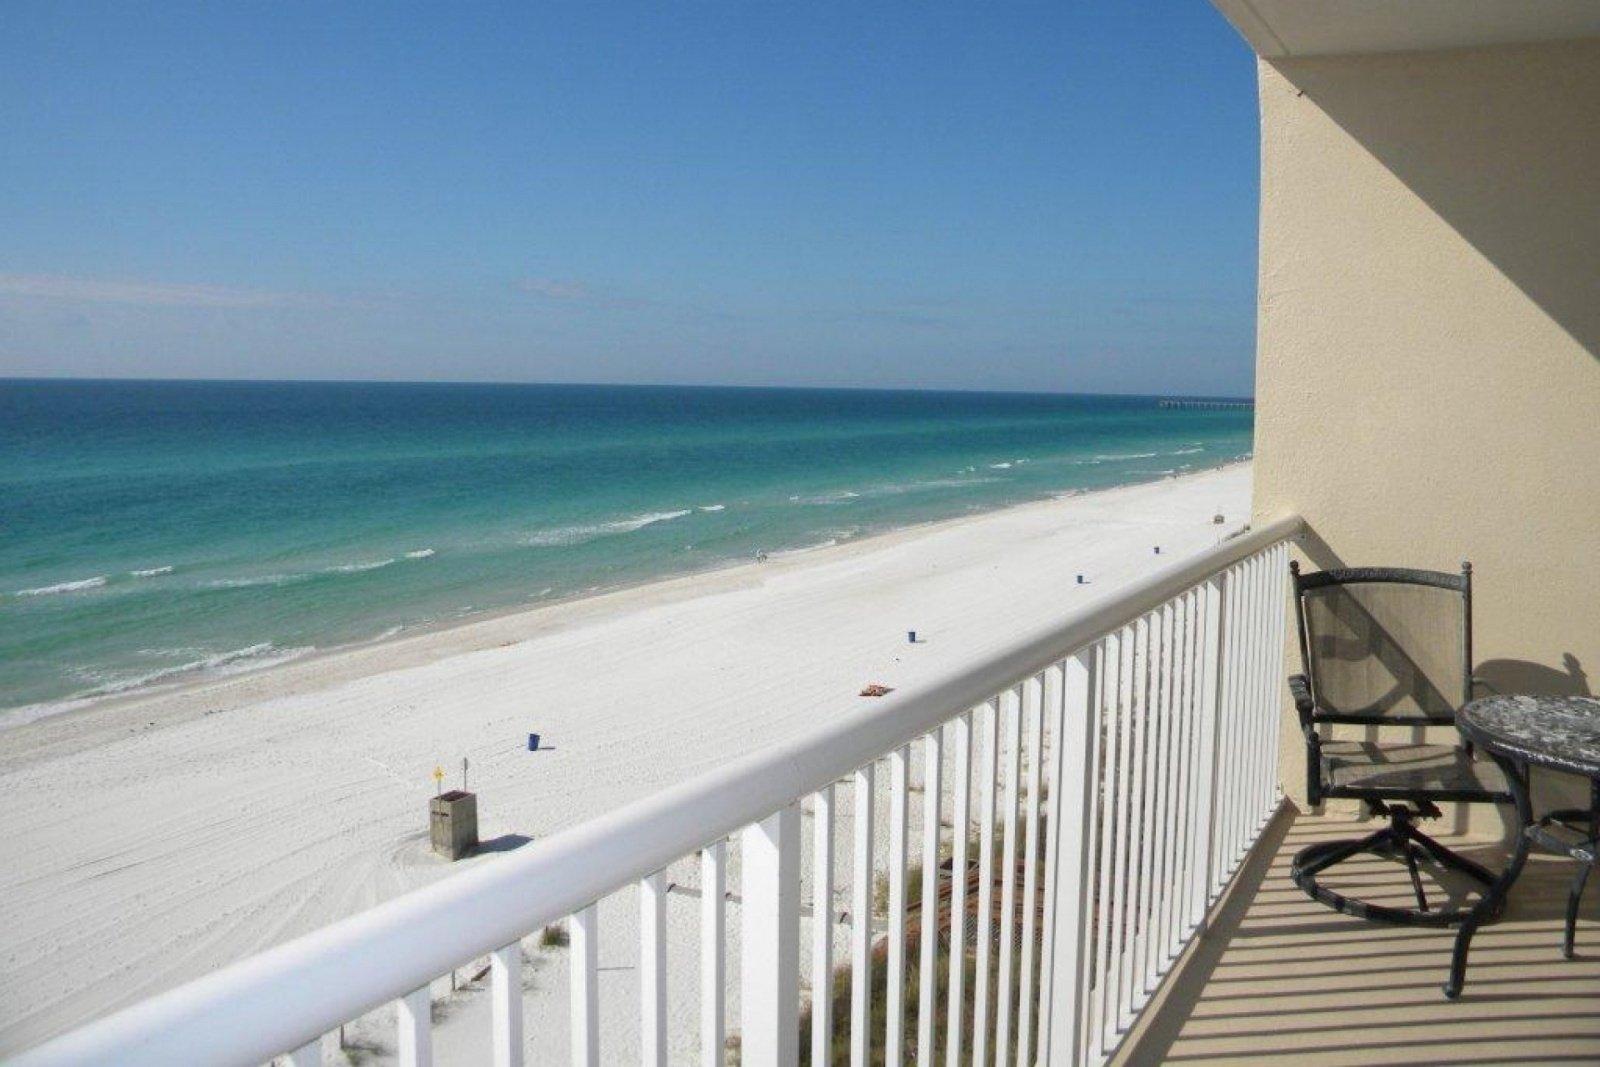 panama city beach vacation rental 604 majestic beach. Black Bedroom Furniture Sets. Home Design Ideas